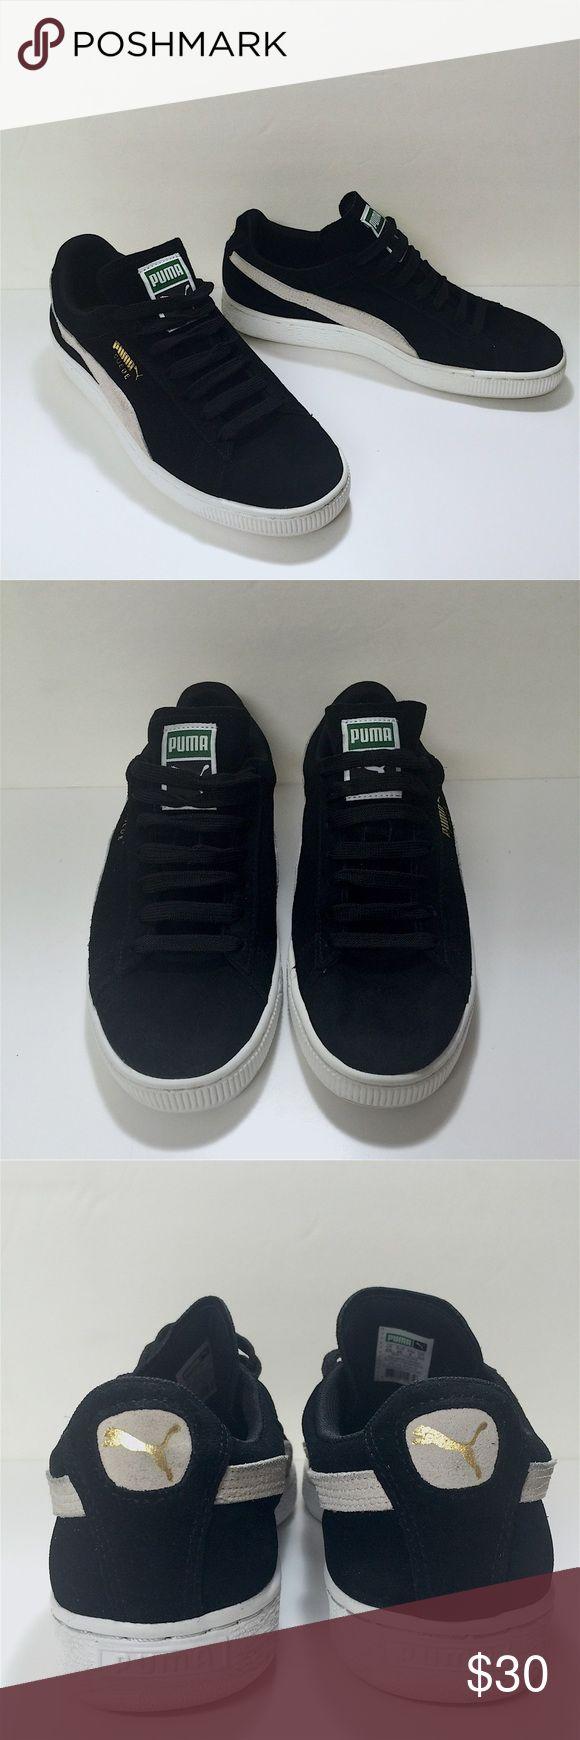 Black PUMA suede tennis shoes Black PUMA suede tennis shoes. Black suede and off white colored suede, white rubber bottoms. Women's US size 9, worn once, great condition! Puma Shoes Athletic Shoes